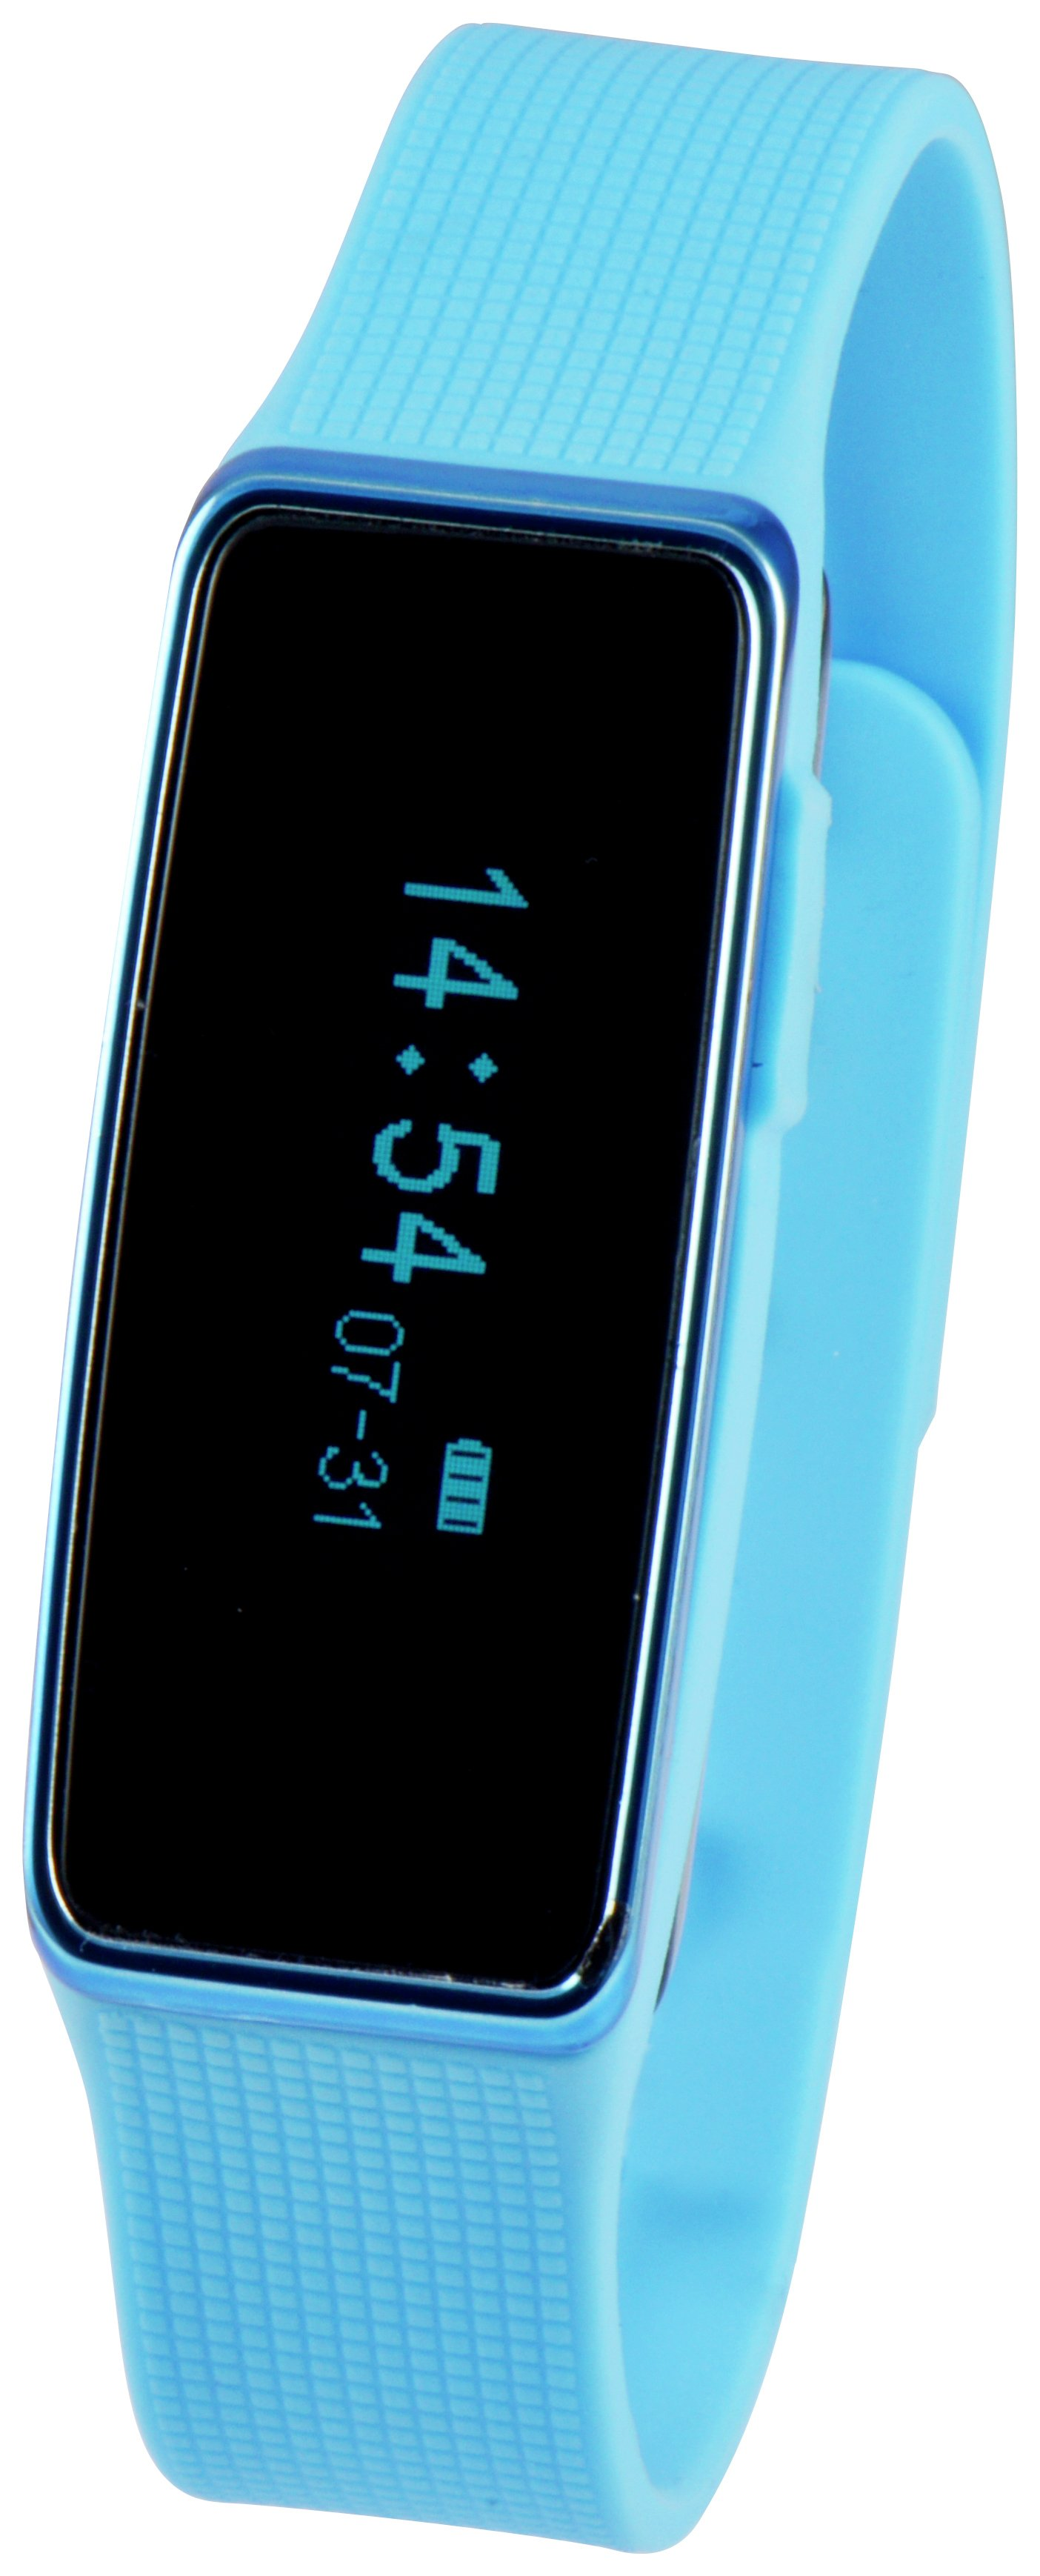 Nuband Activity Tracker - Blue